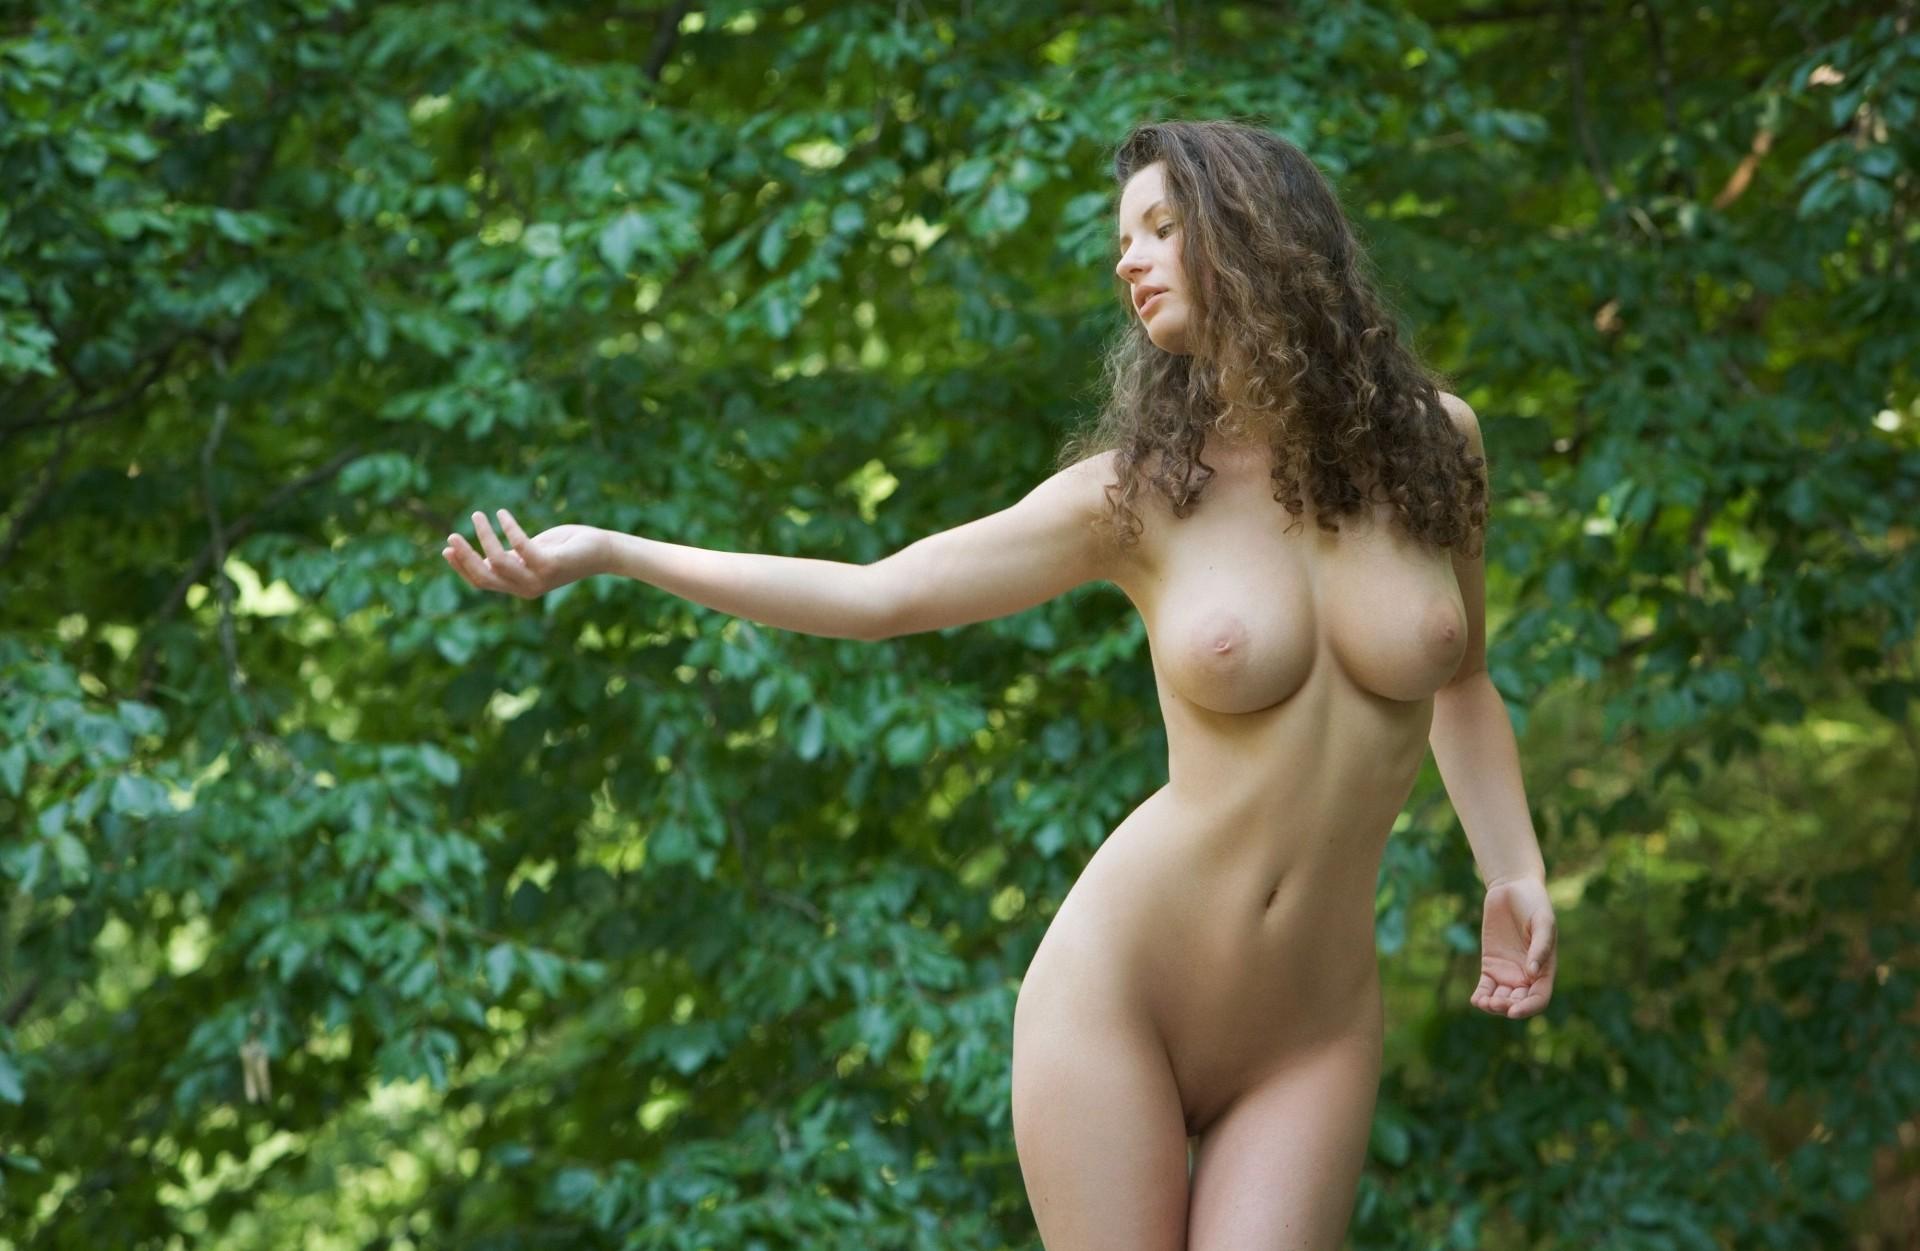 Girl nude swf, bobbie starr faye reagon porn video